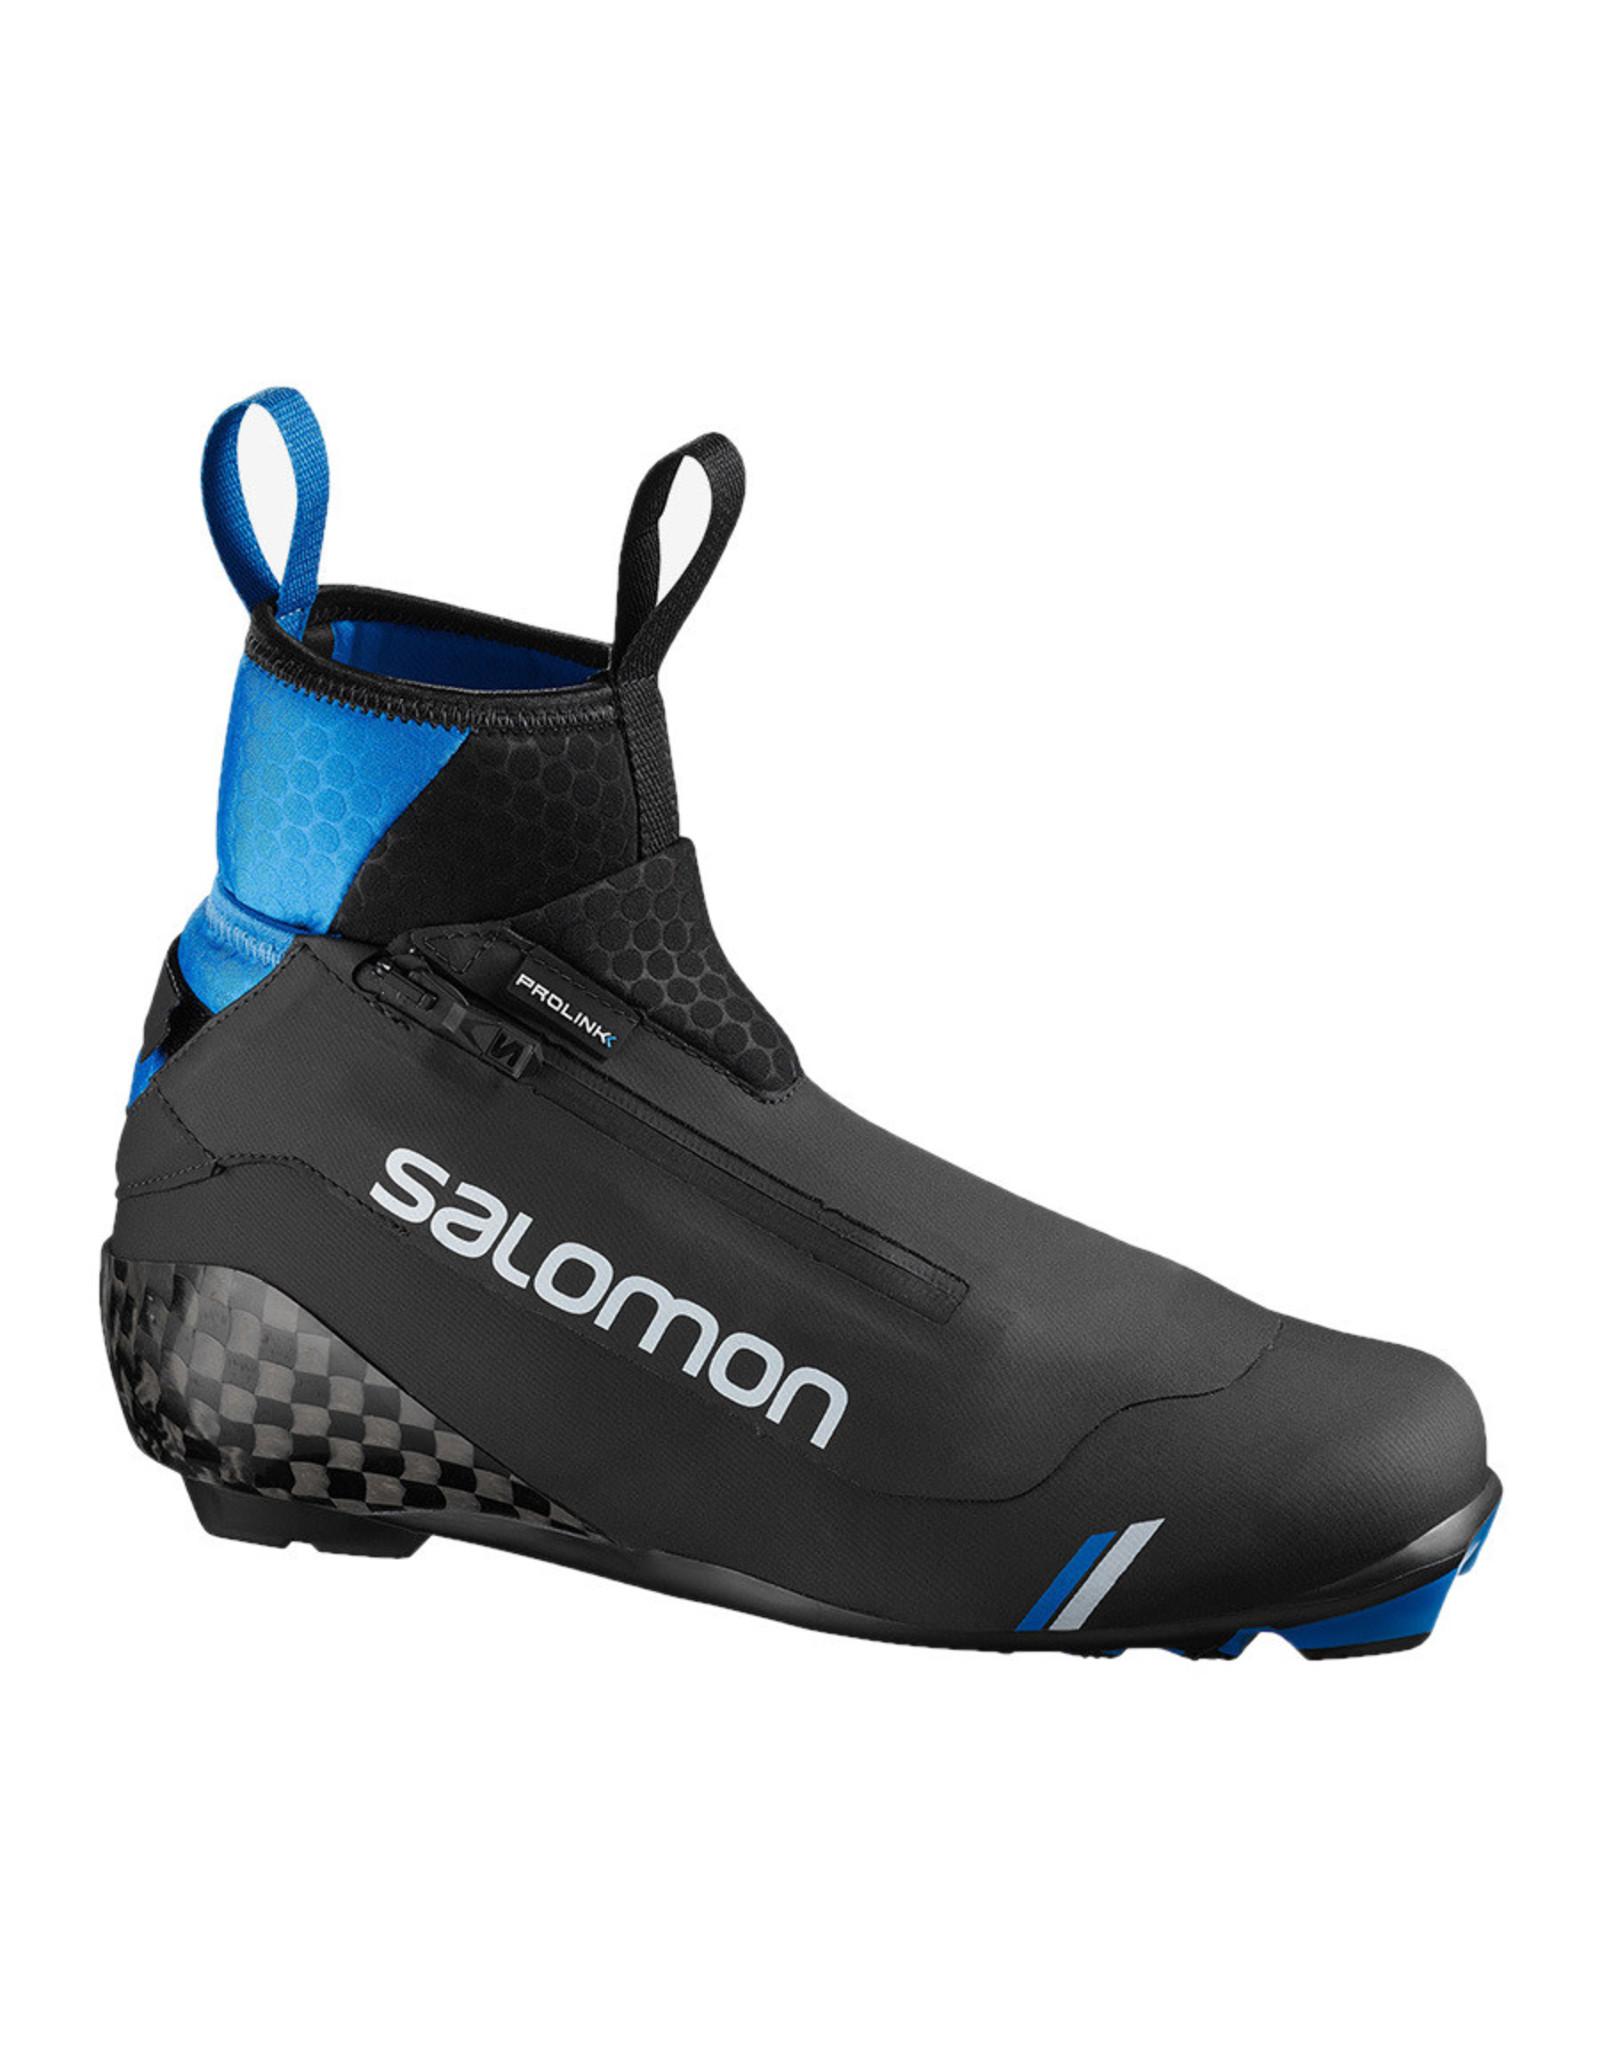 Salomon Salomon S/Race Classic Prolink Boots